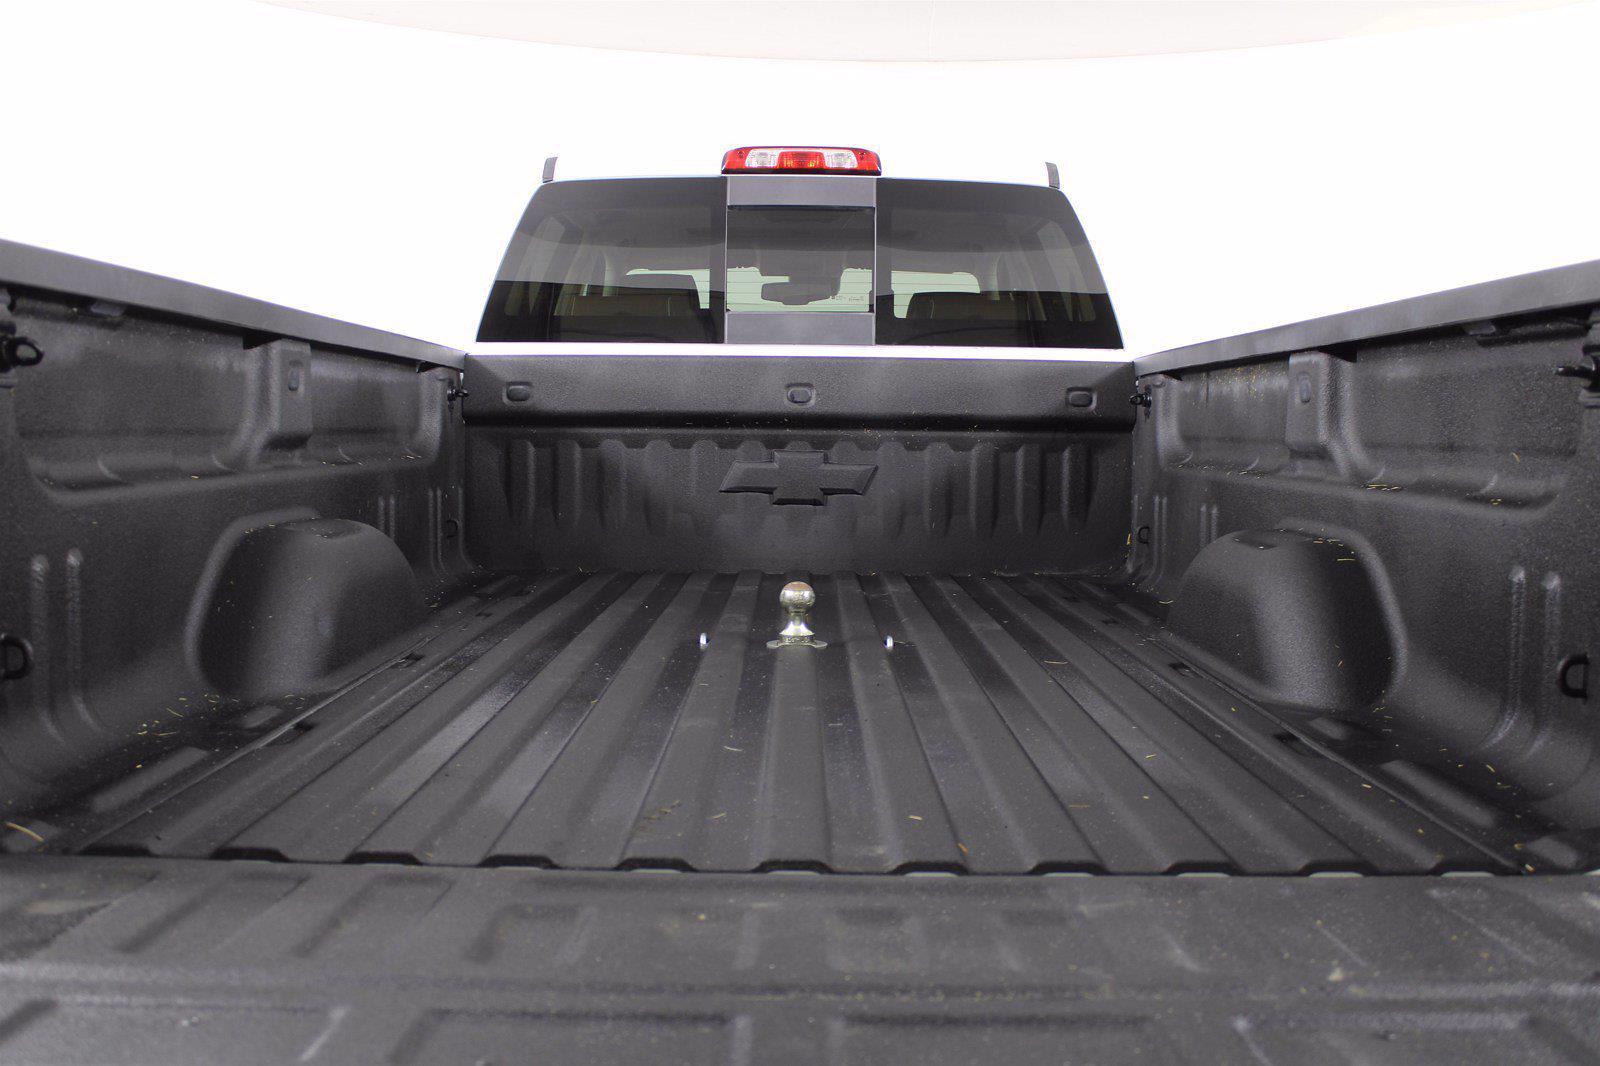 2018 Chevrolet Silverado 3500 Crew Cab 4x4, Pickup #DU90958 - photo 3